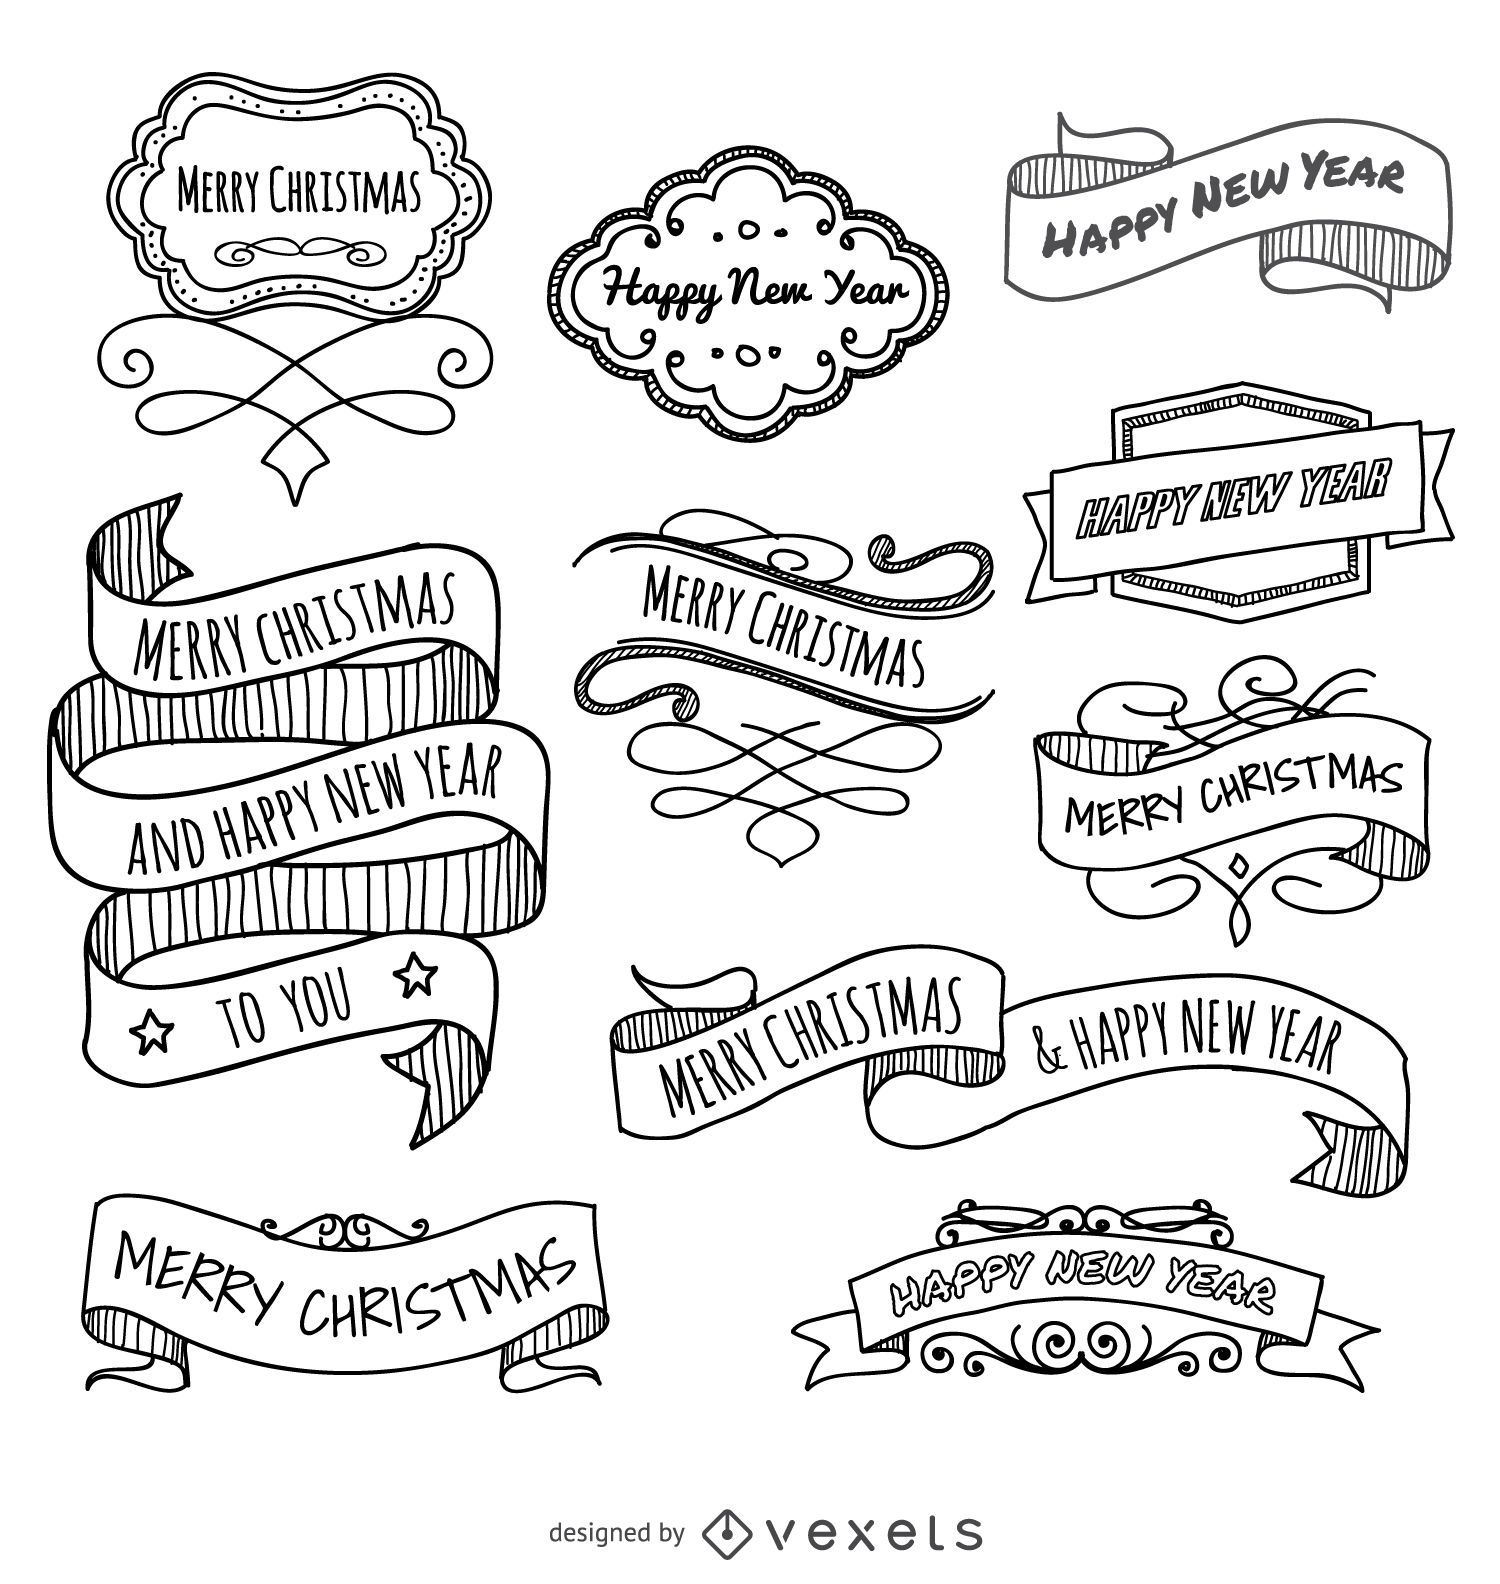 Christmas doodles ribbons